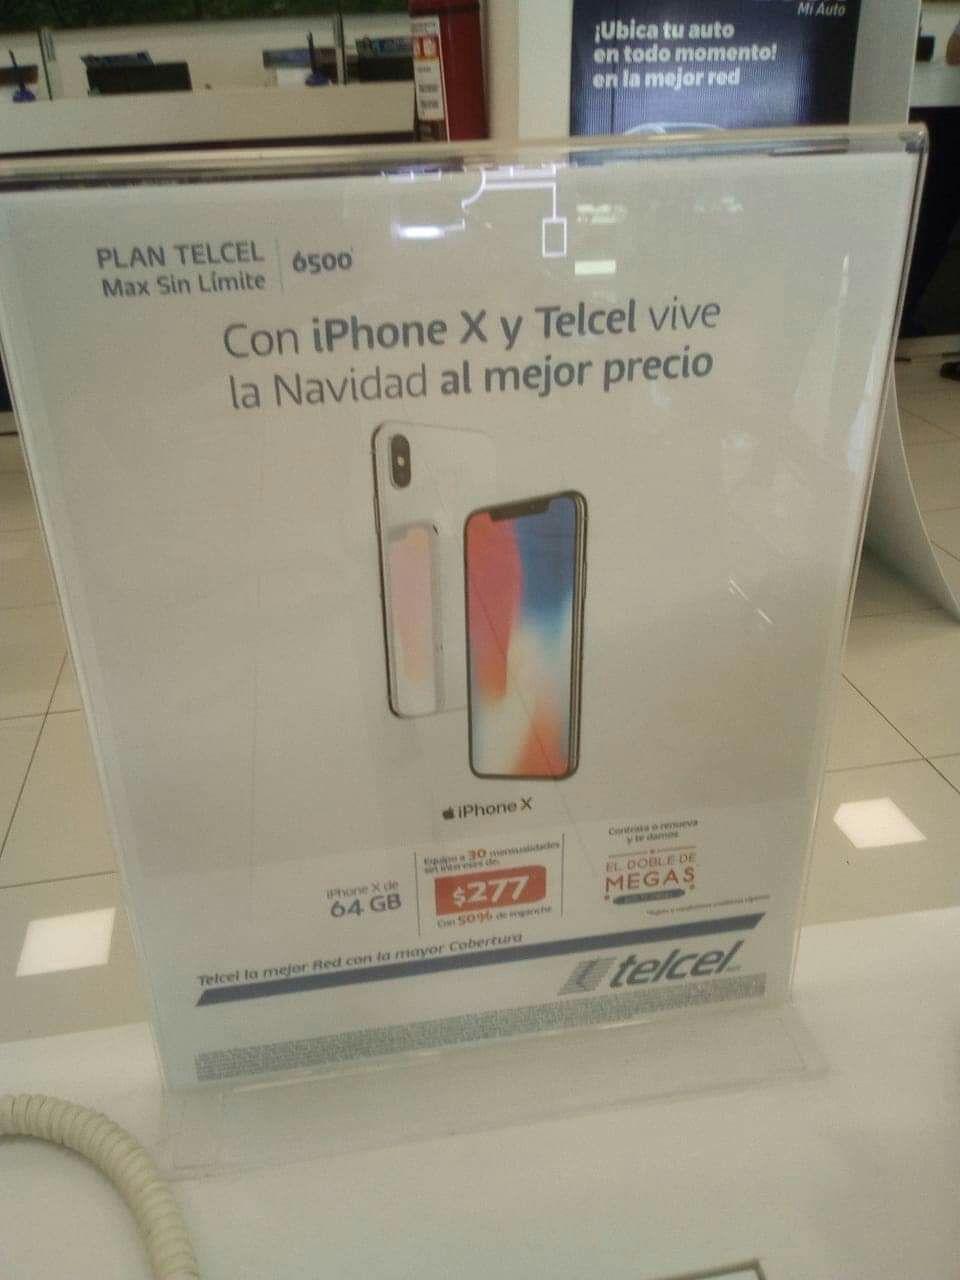 Telcel: Iphone X en plan telcel 699